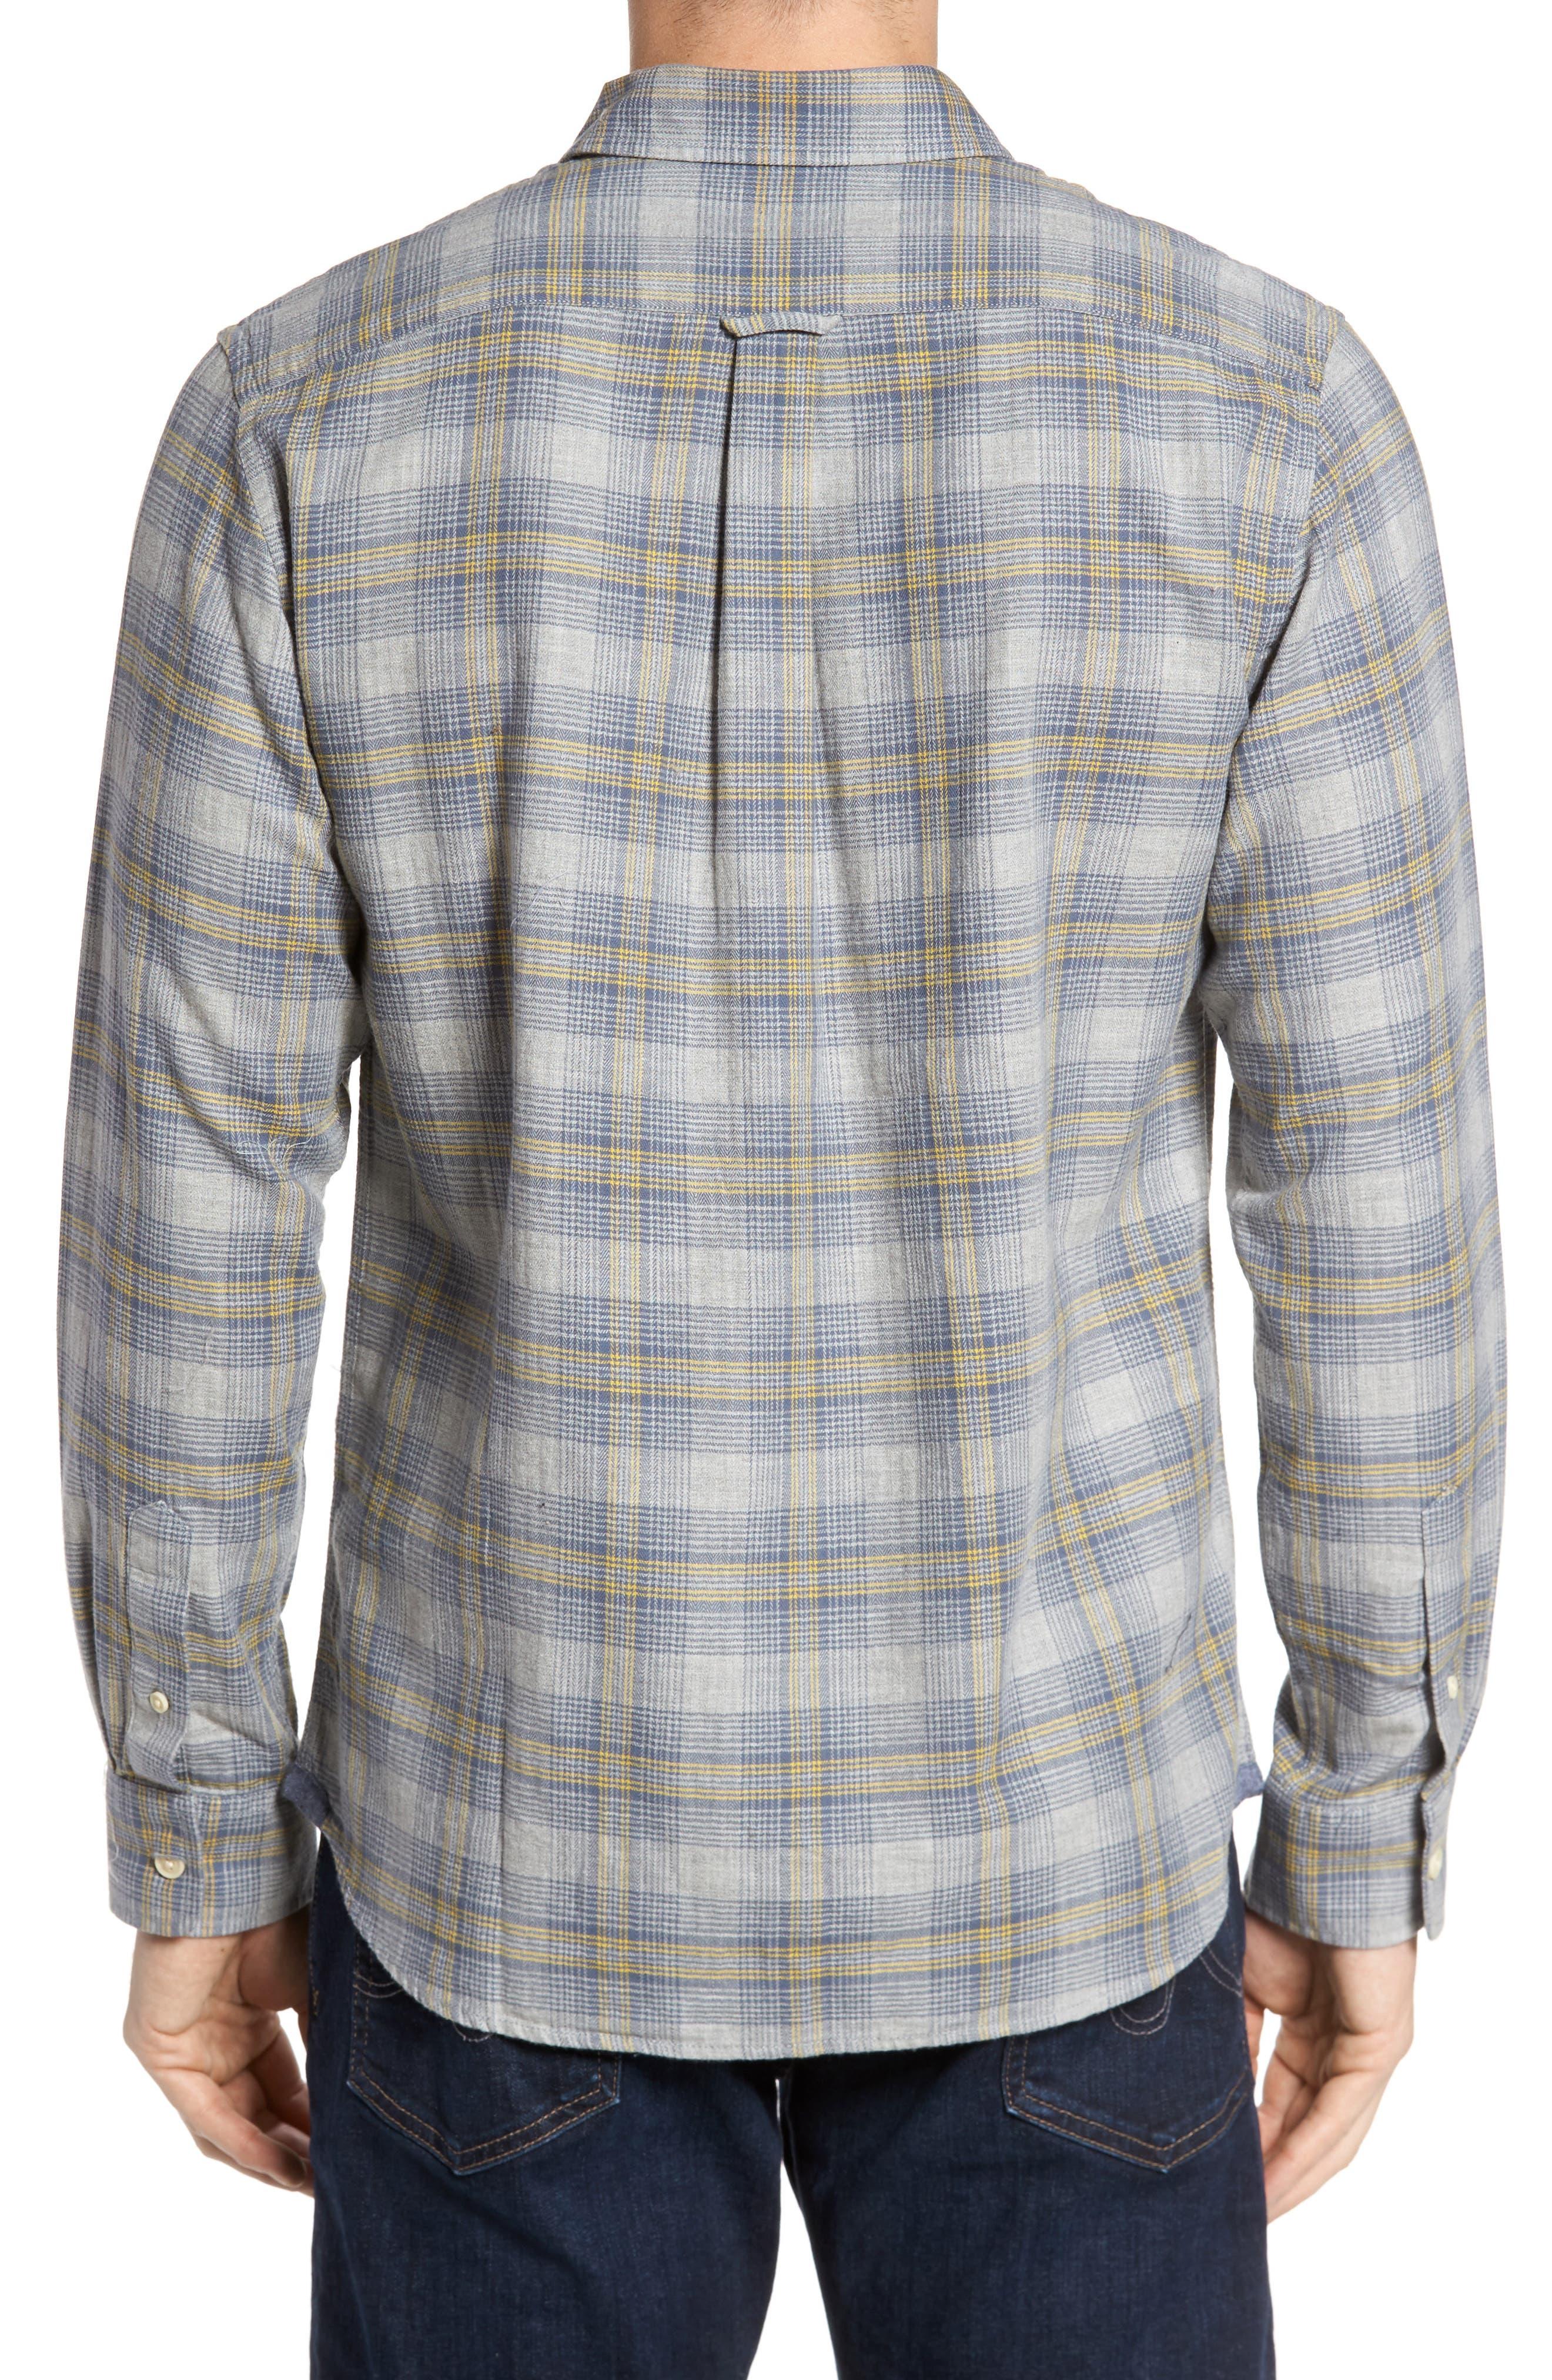 Laugna Herringbone Twill Shirt,                             Alternate thumbnail 2, color,                             032